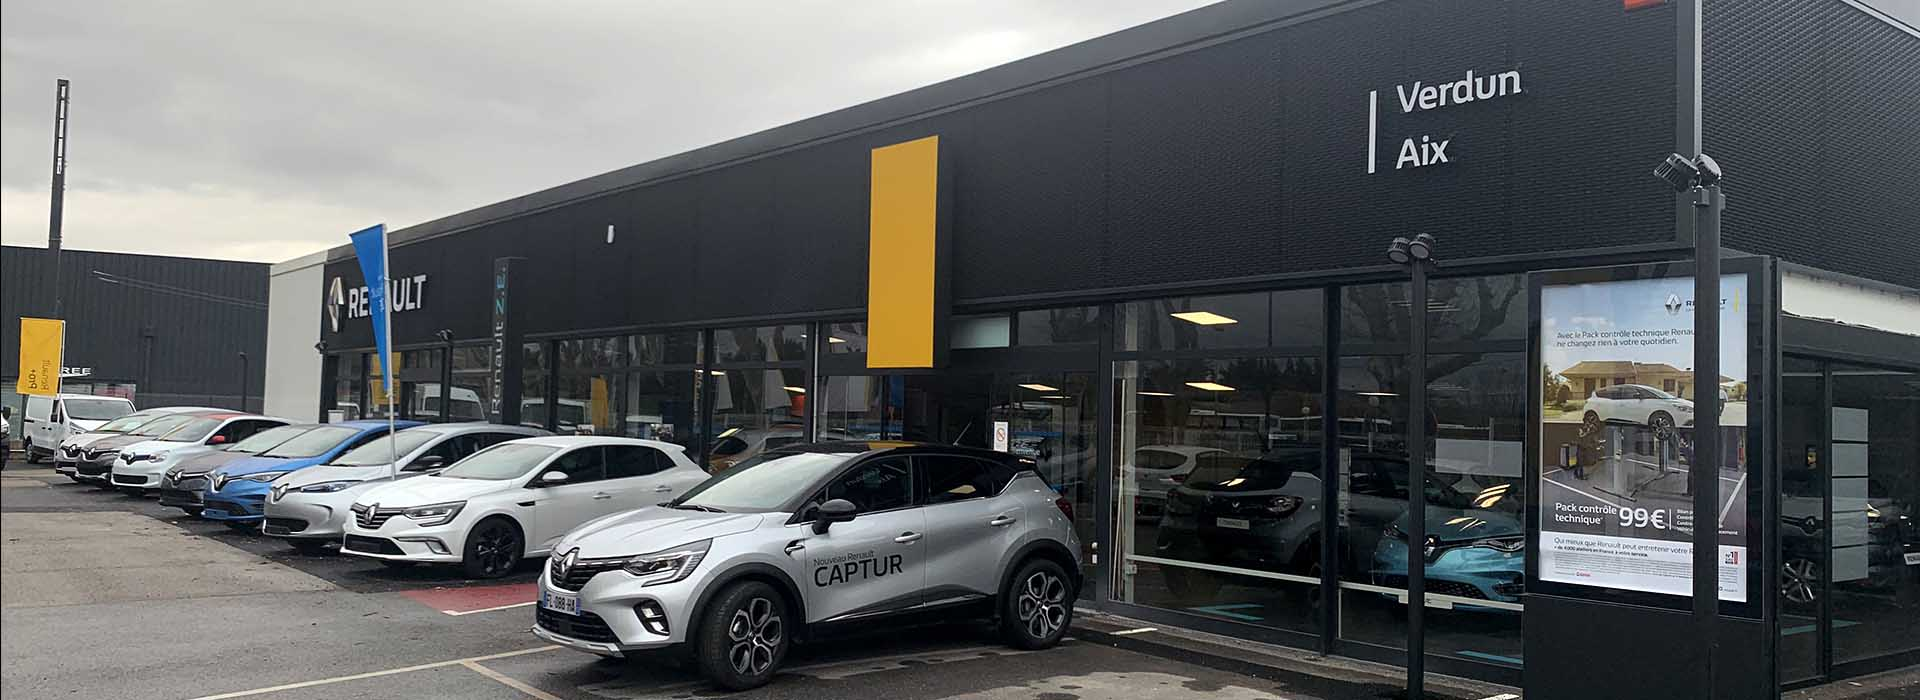 Renault pertuis concessionnaire garage vaucluse 84 for Garage pertuis occasion